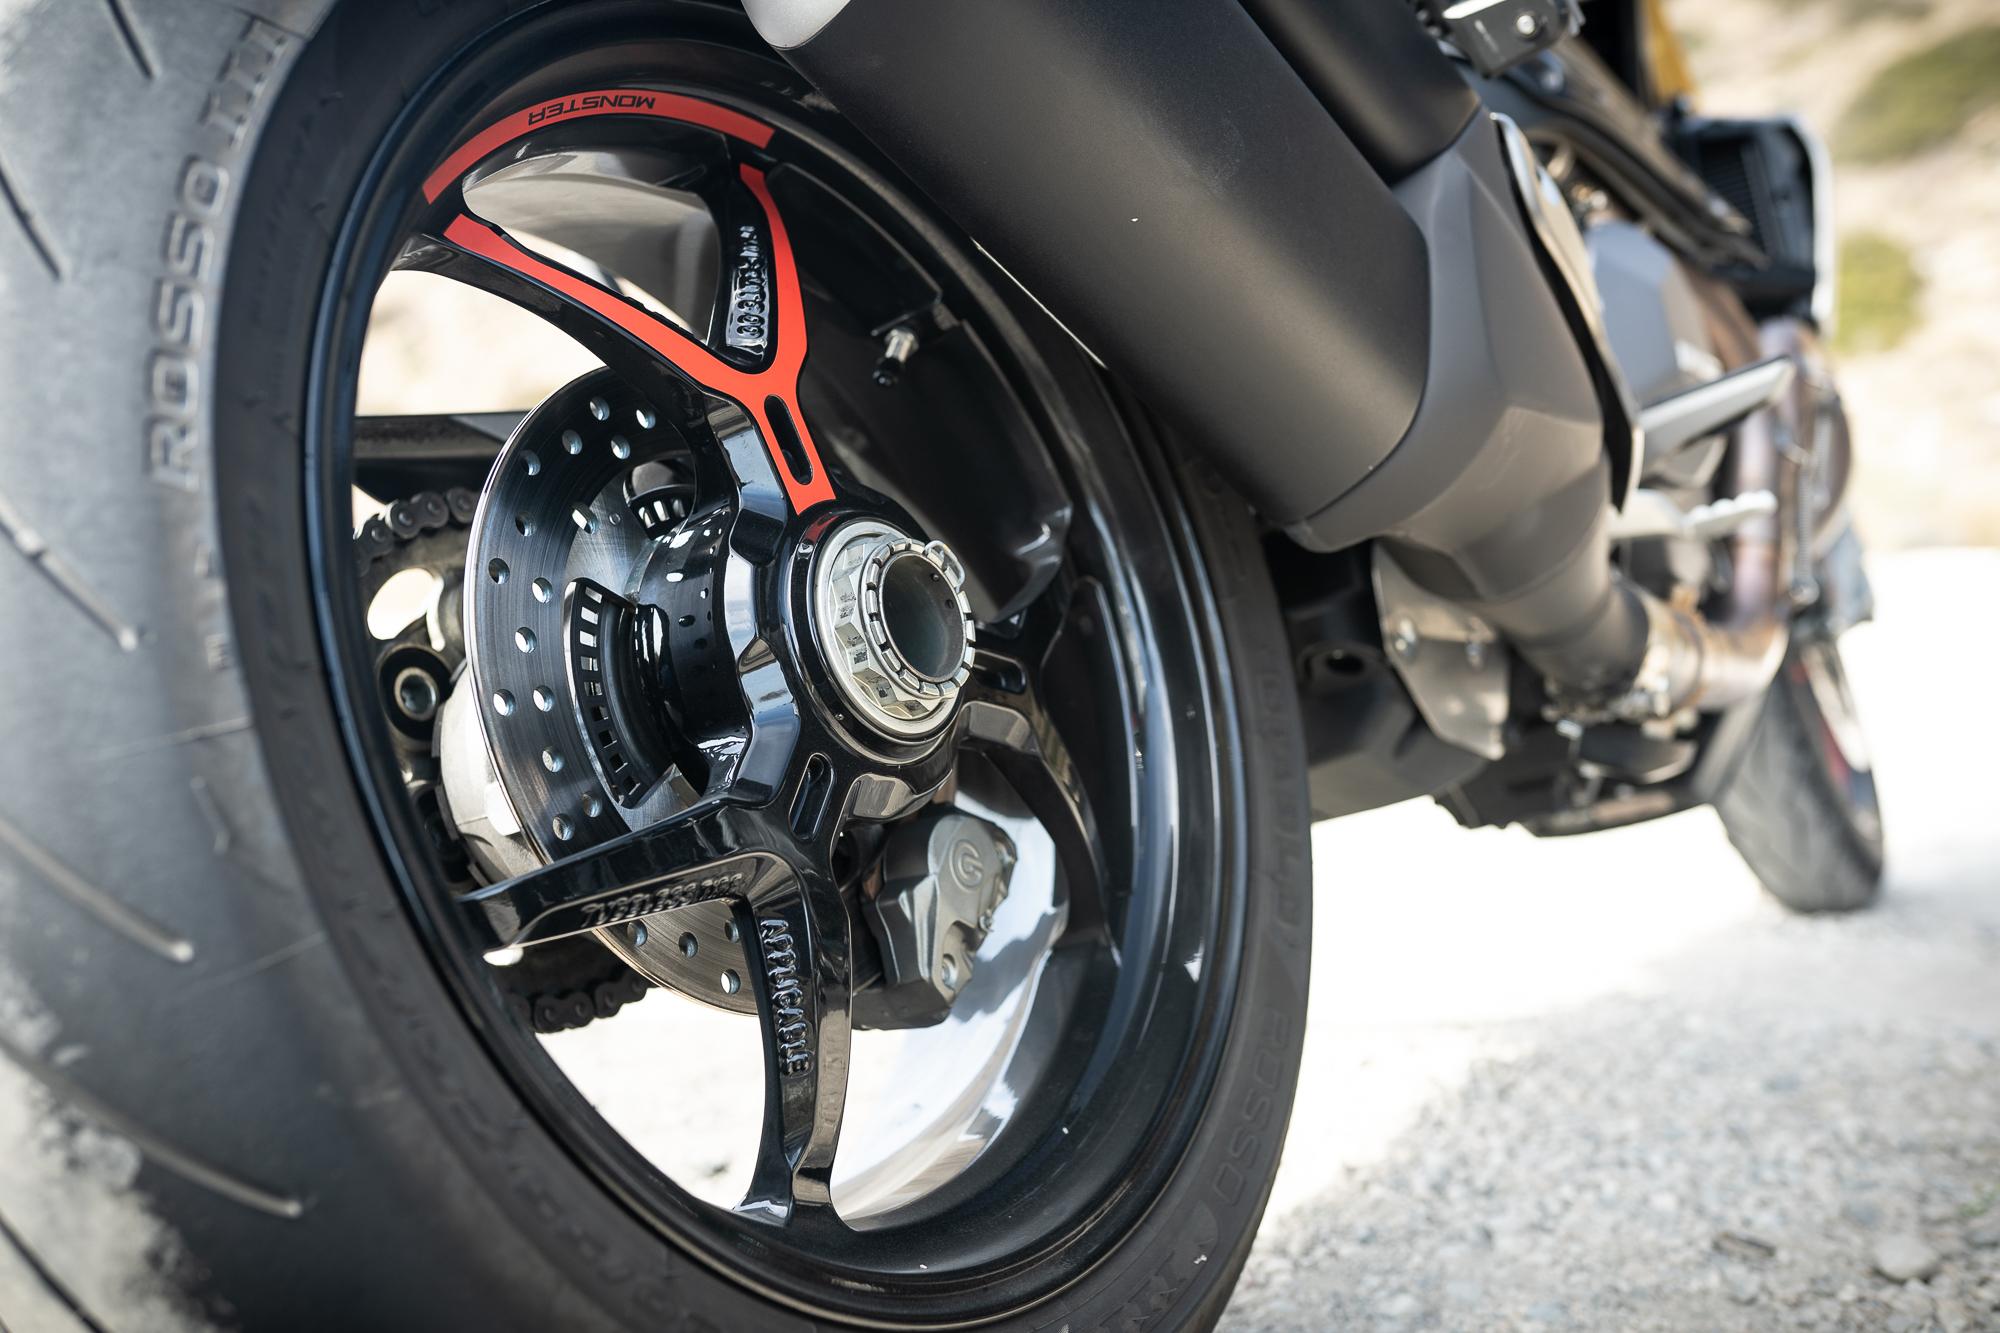 2021 Ducati Monster 1200 S rear wheel detail